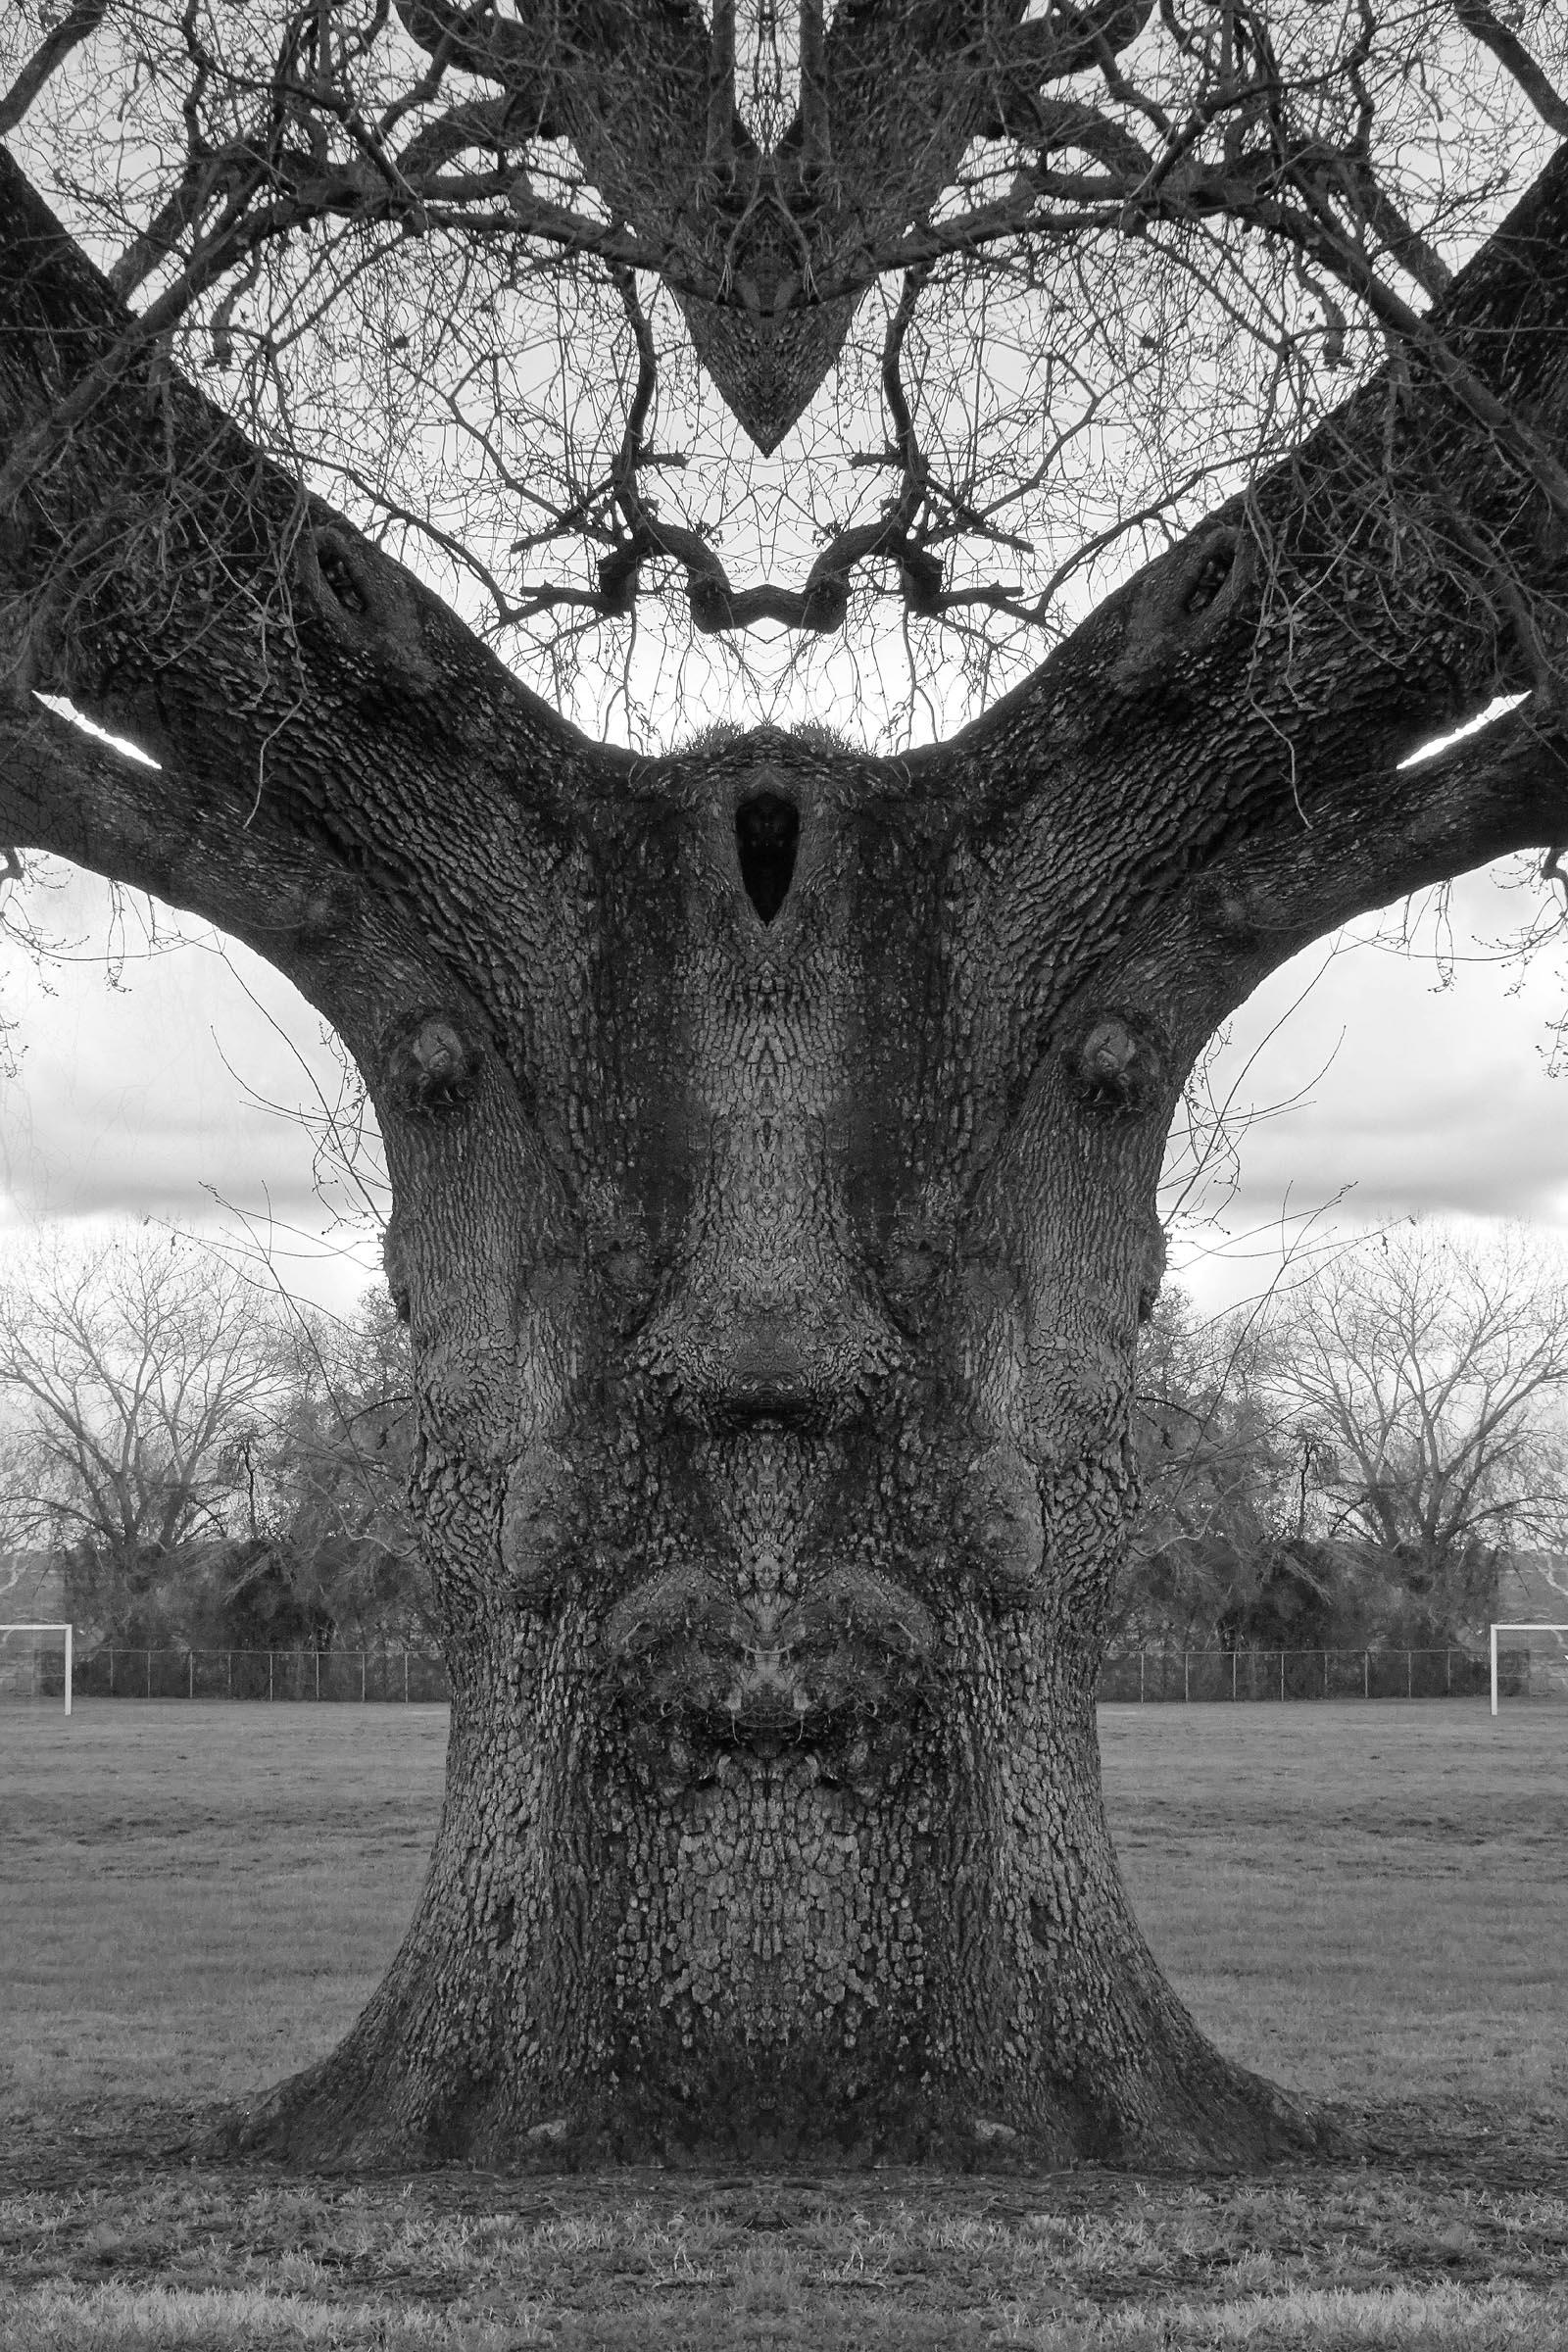 Oak school playground...#nature - zygzwurx   ello